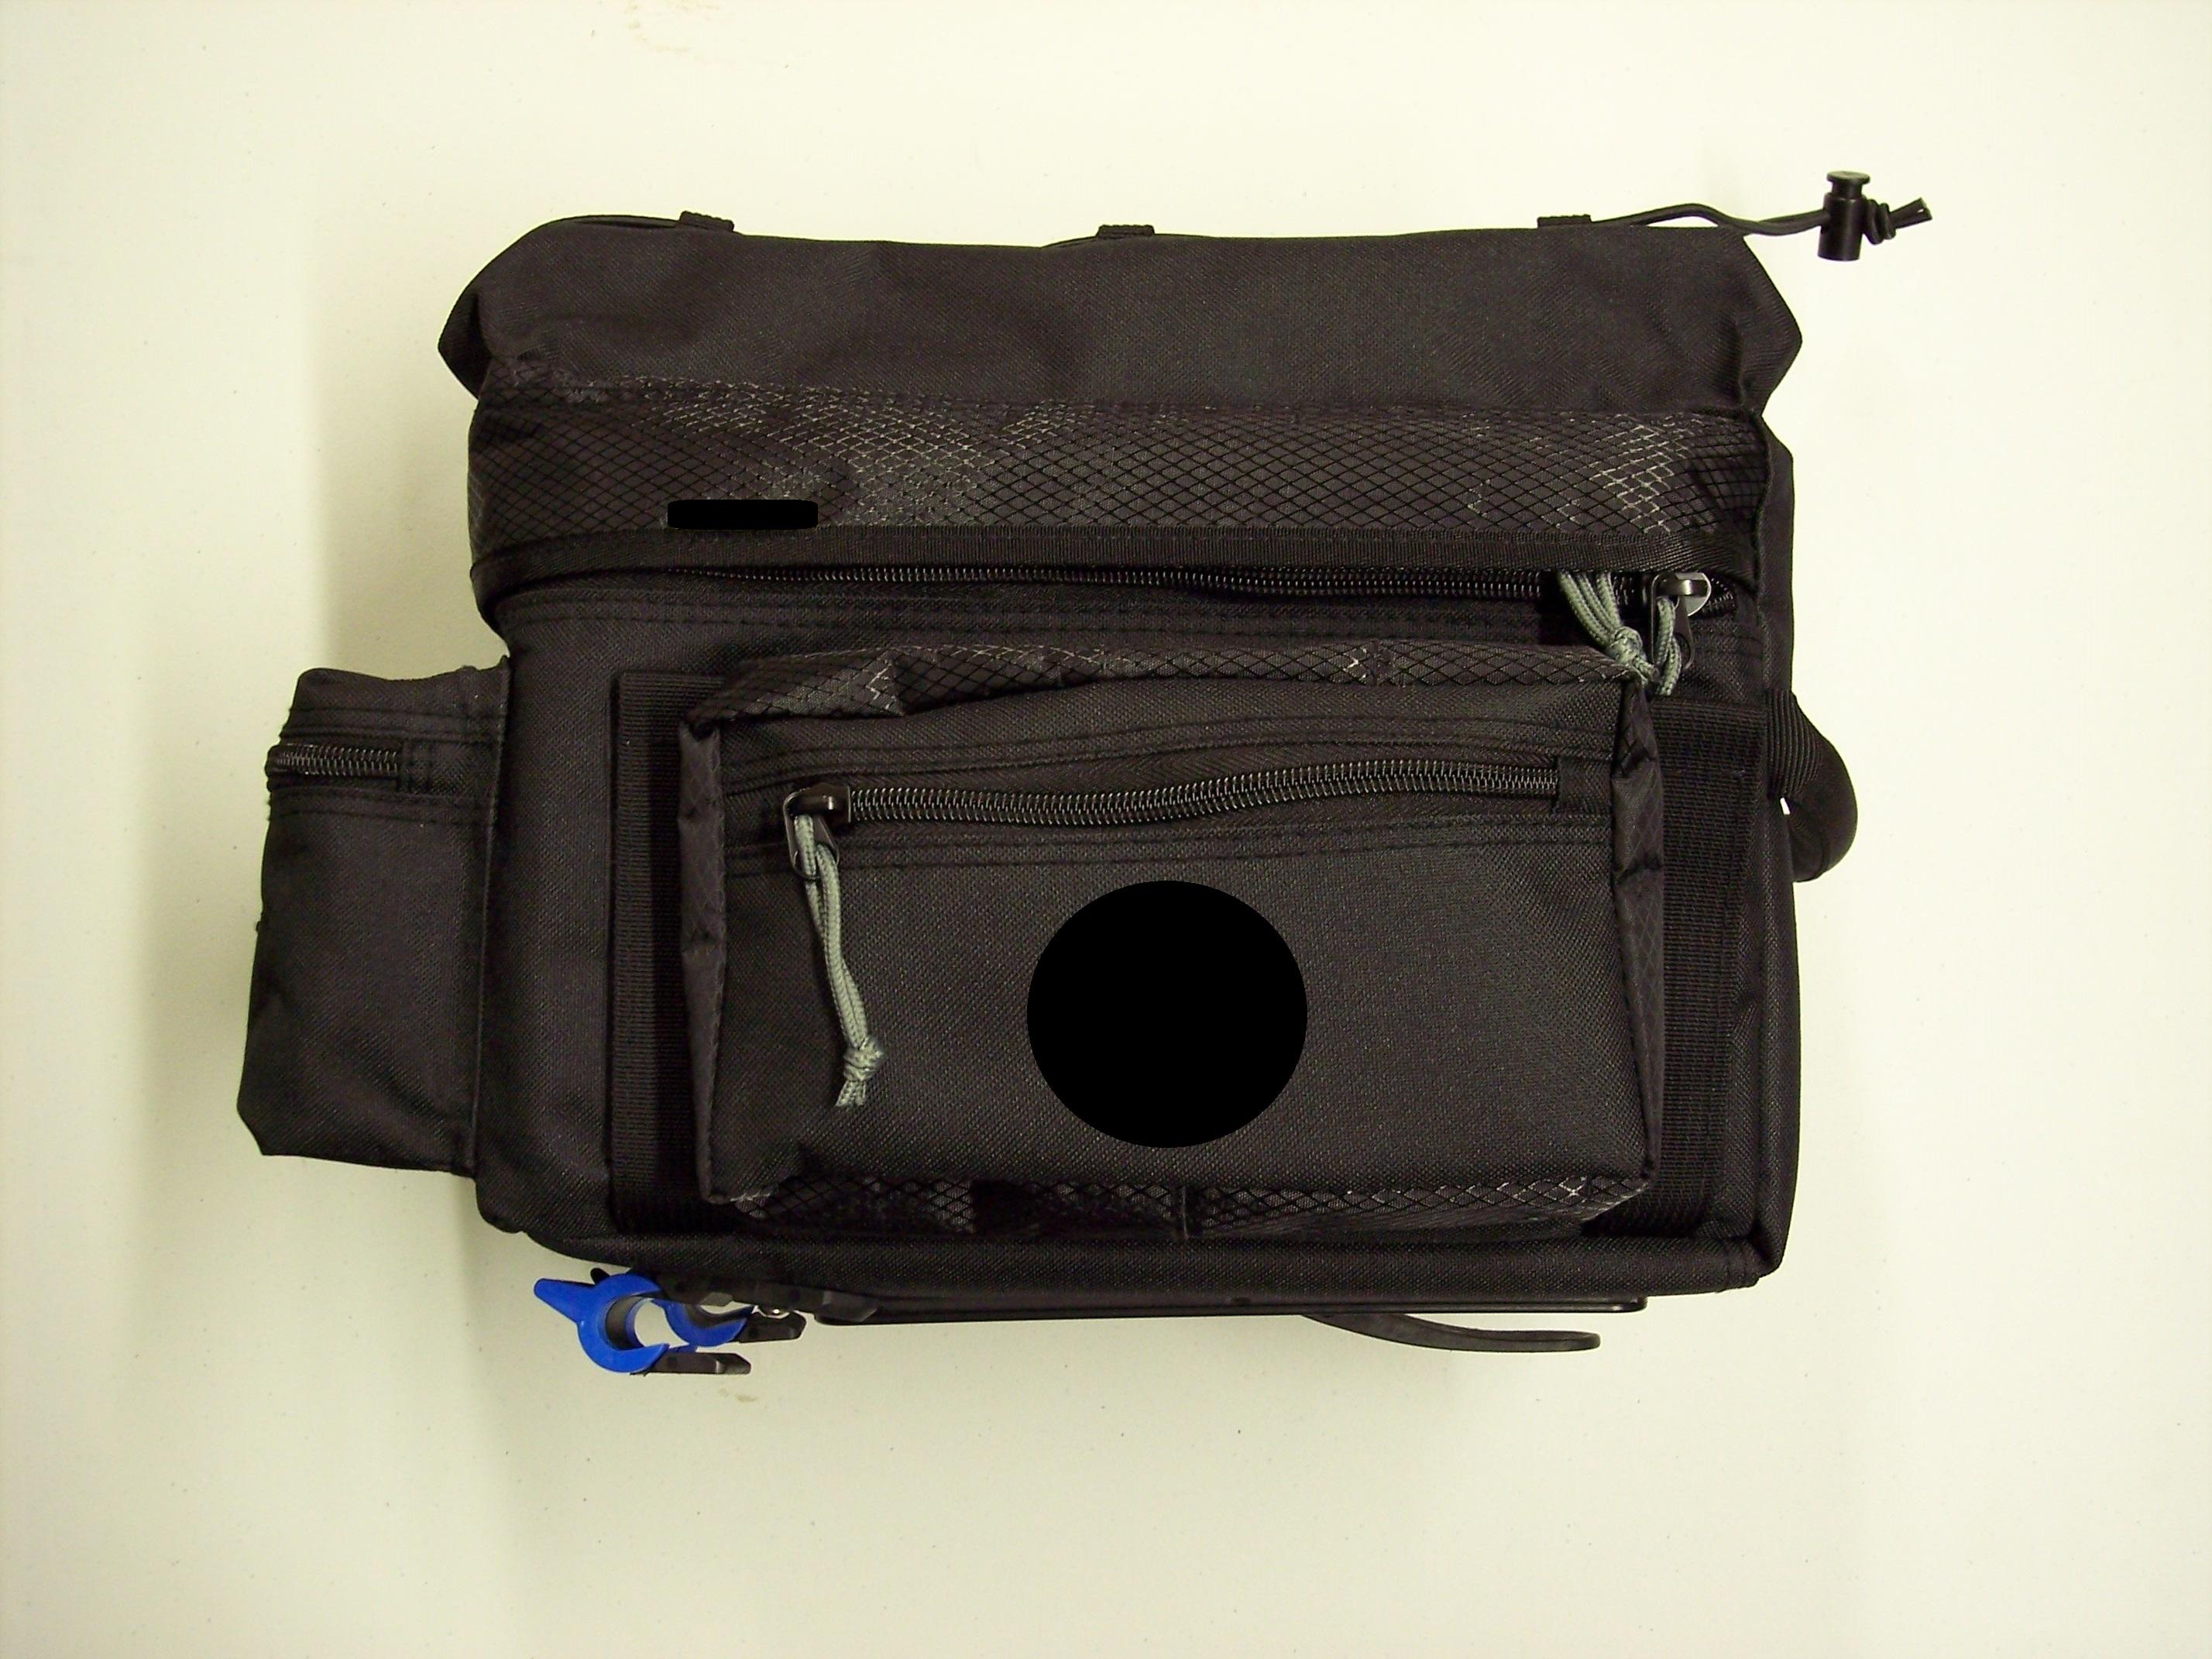 Two Wheel Gear - DIY Front Trunk Bag